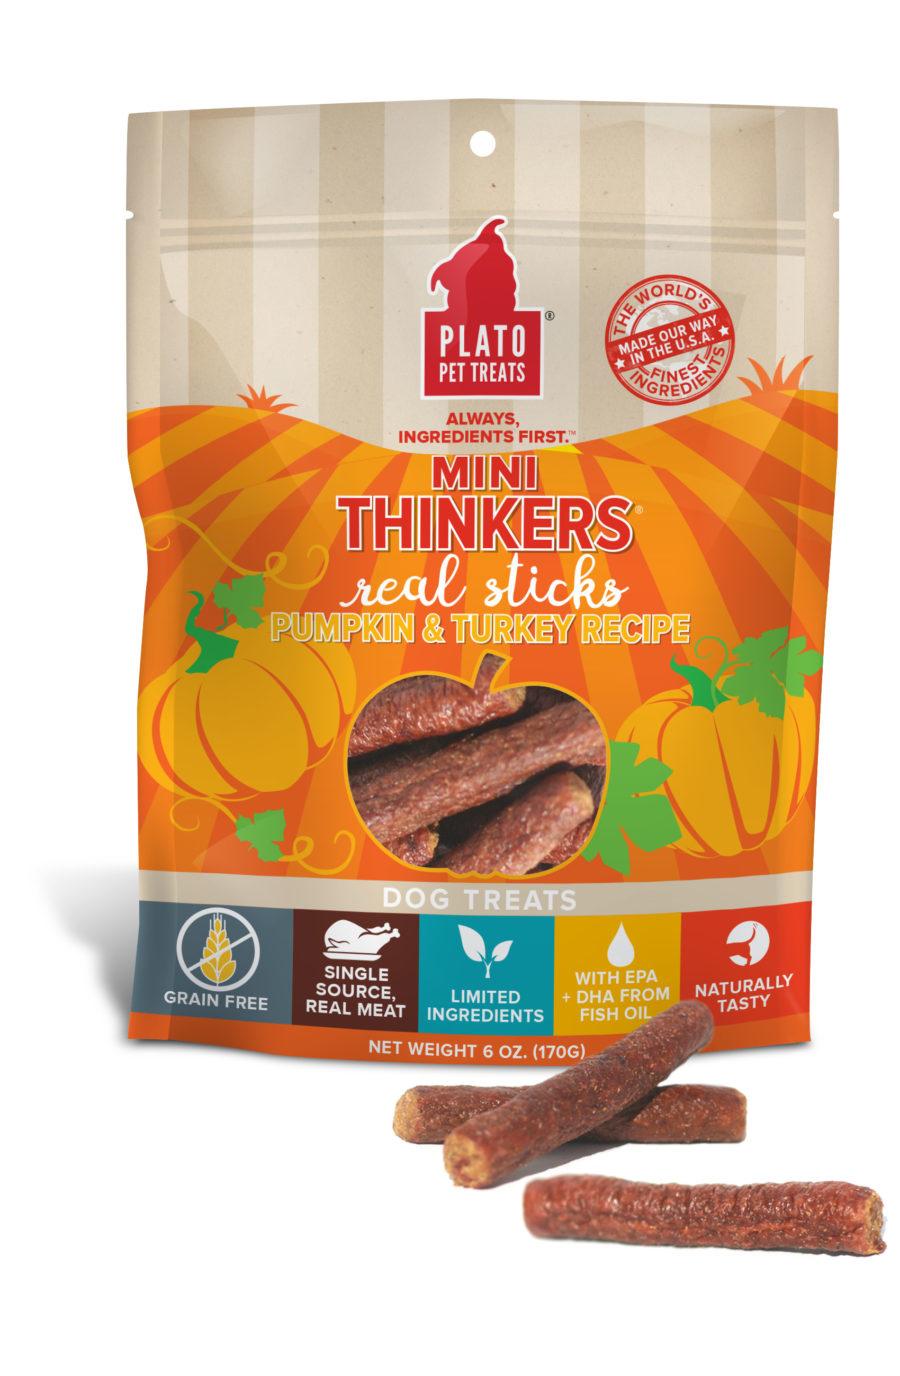 Plato Pet Treats Plato Mini Thinkers Grain Free Pumpkin & Turkey